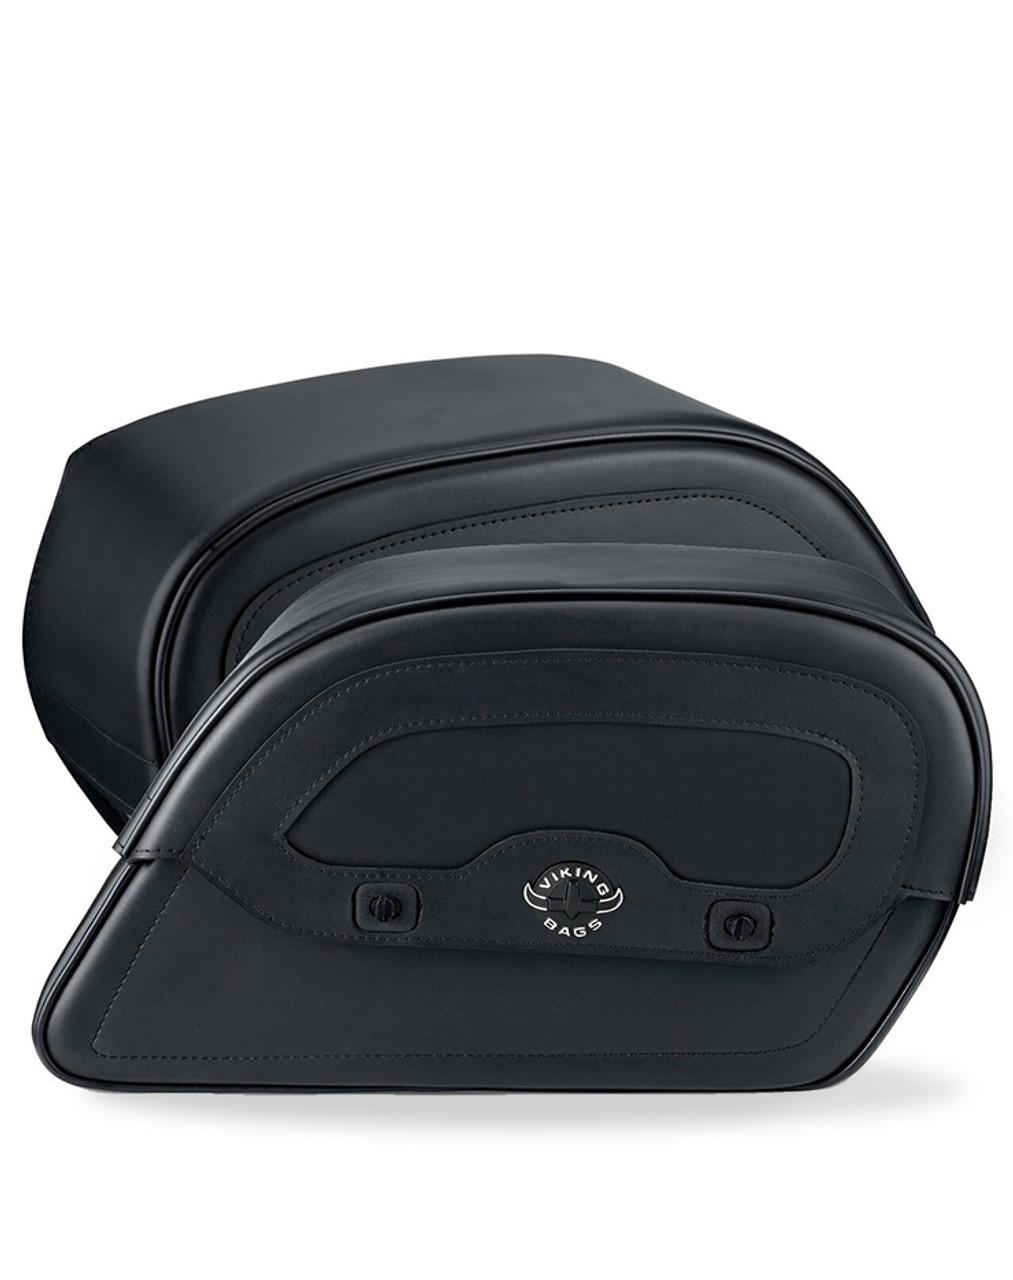 Honda VTX 1800 N Warrior Slanted Large Leather Motorcycle Saddlebags Both Bags View